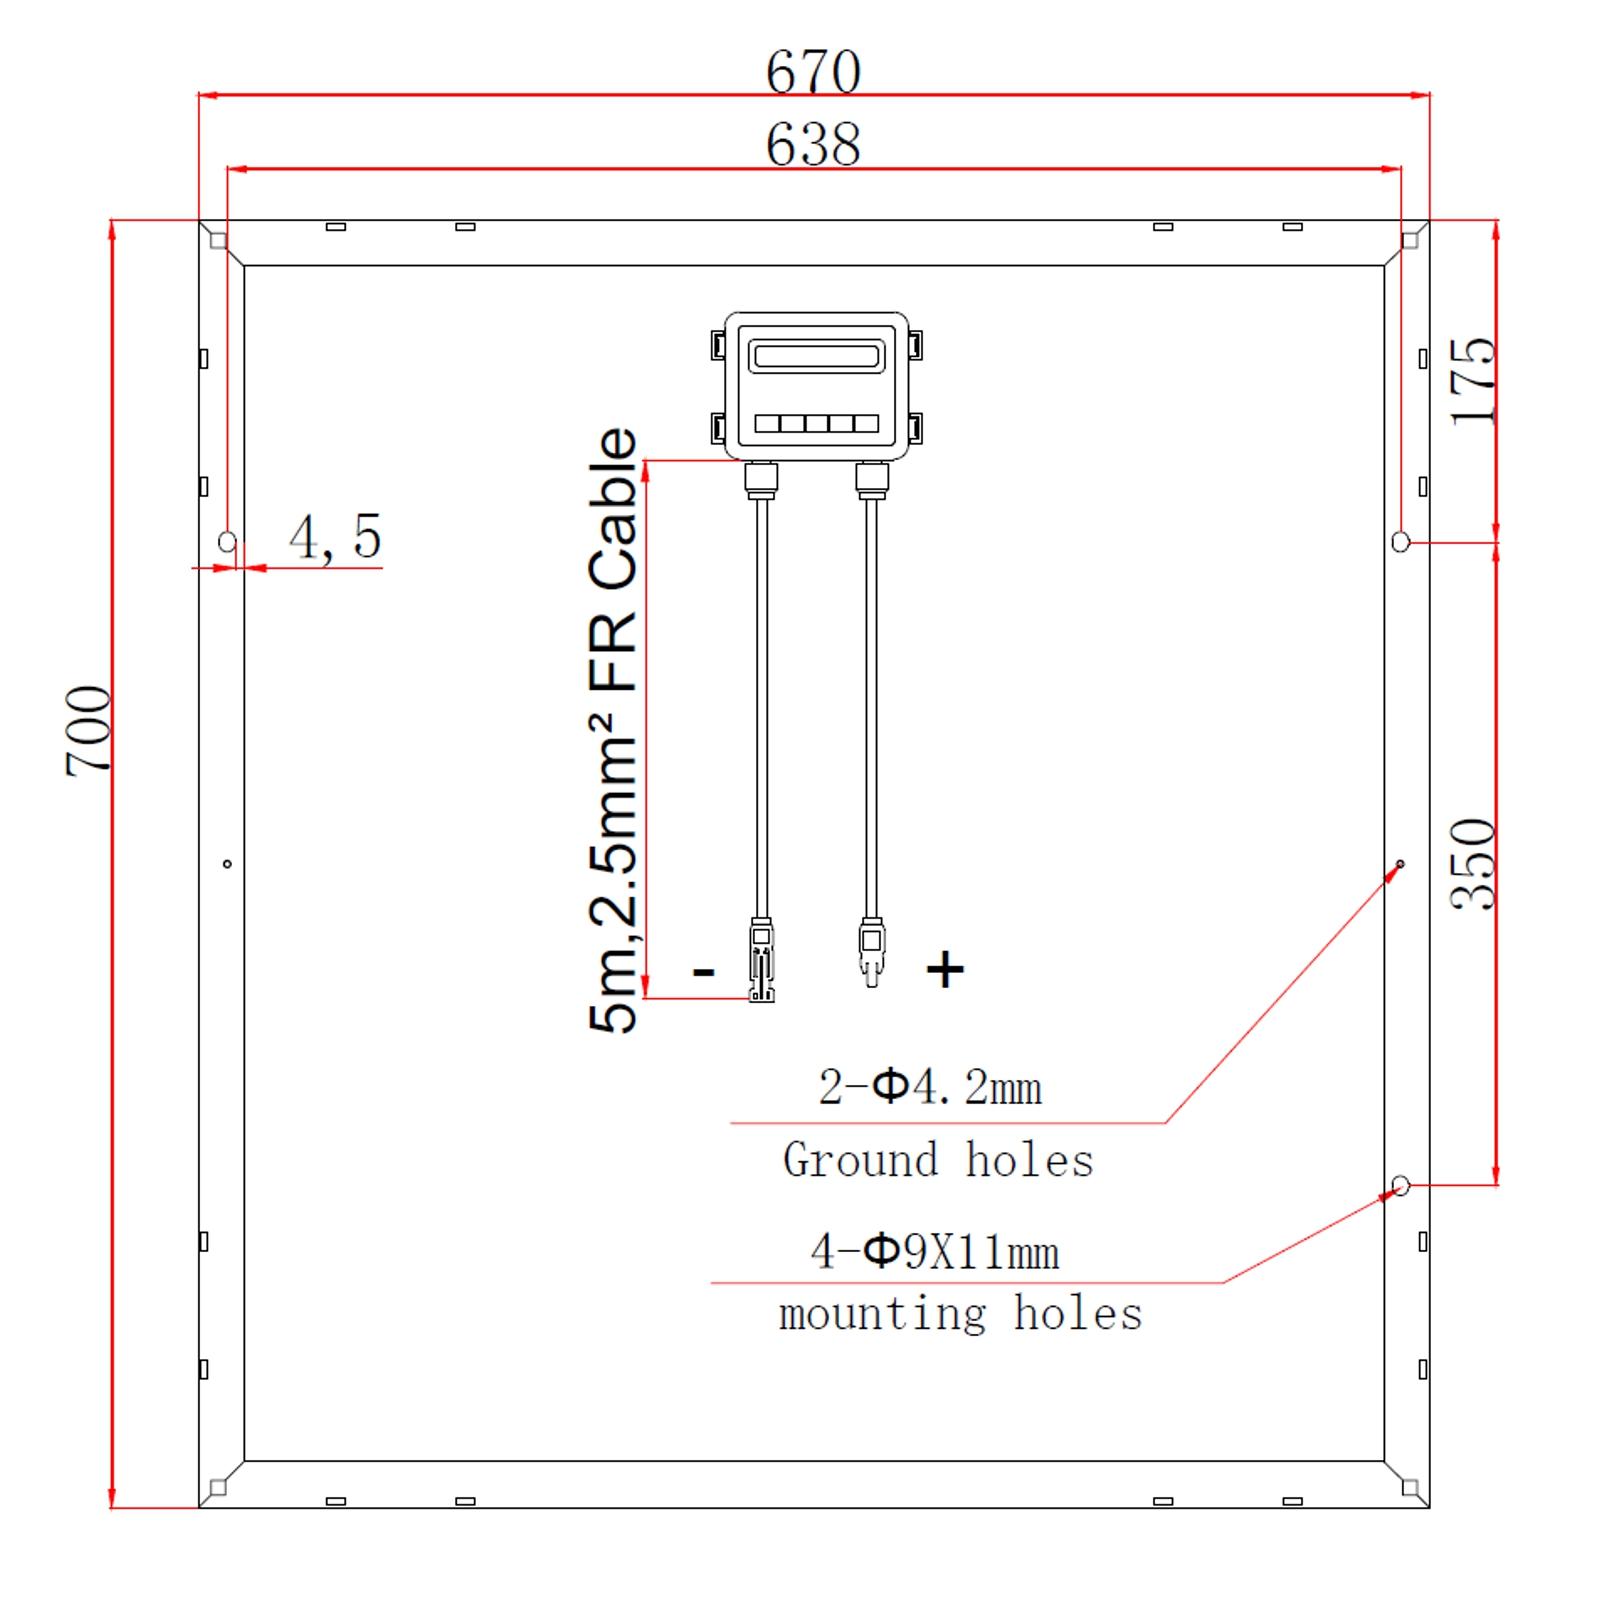 12v 100ah battery charger circuit diagram meyer e 60 snow plow wiring solar panels charging kits for caravans motorhomes